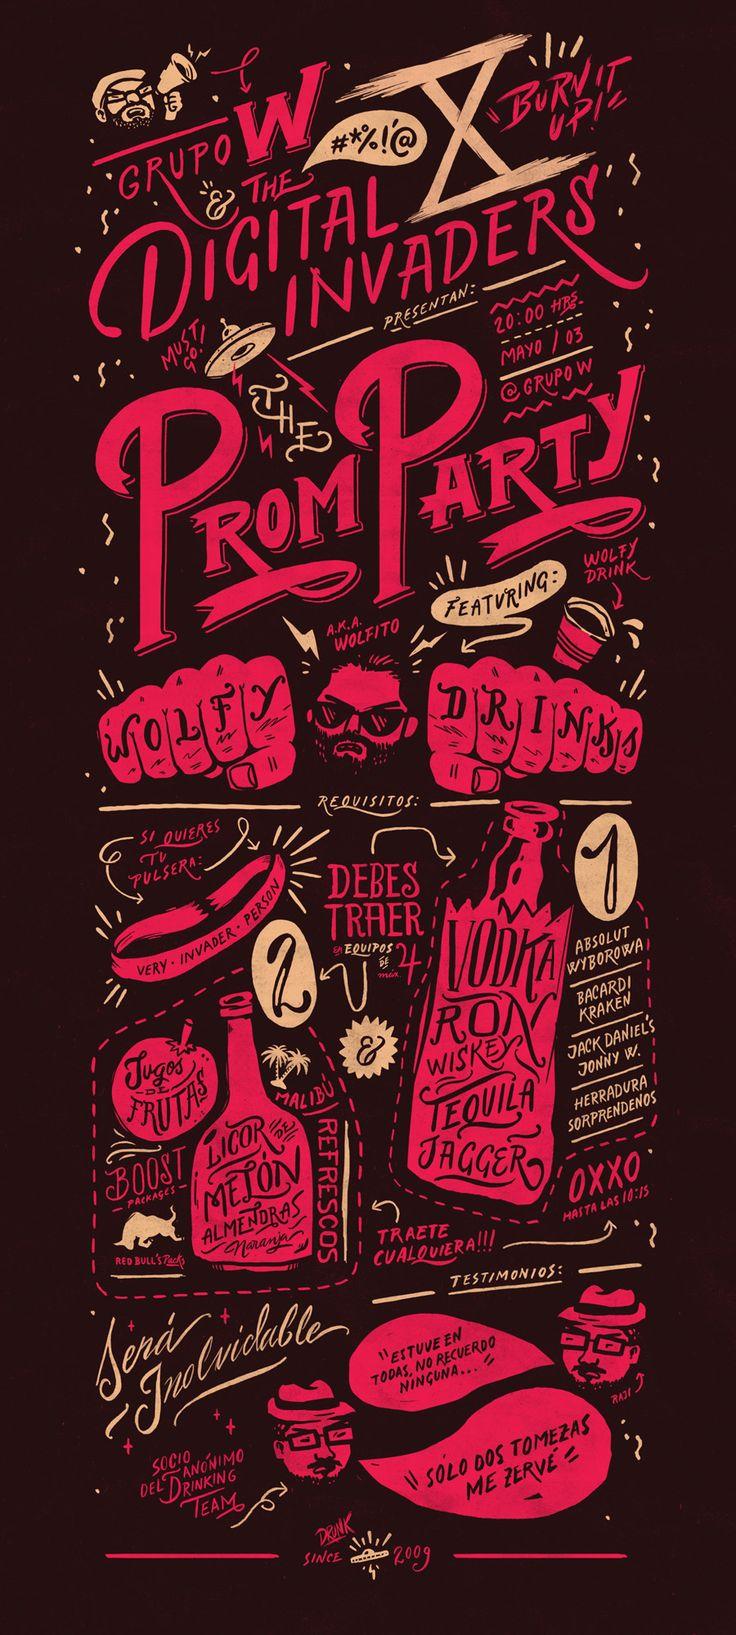 sindy vegas suck Prom Party Poster by Sindy Ethel Salas